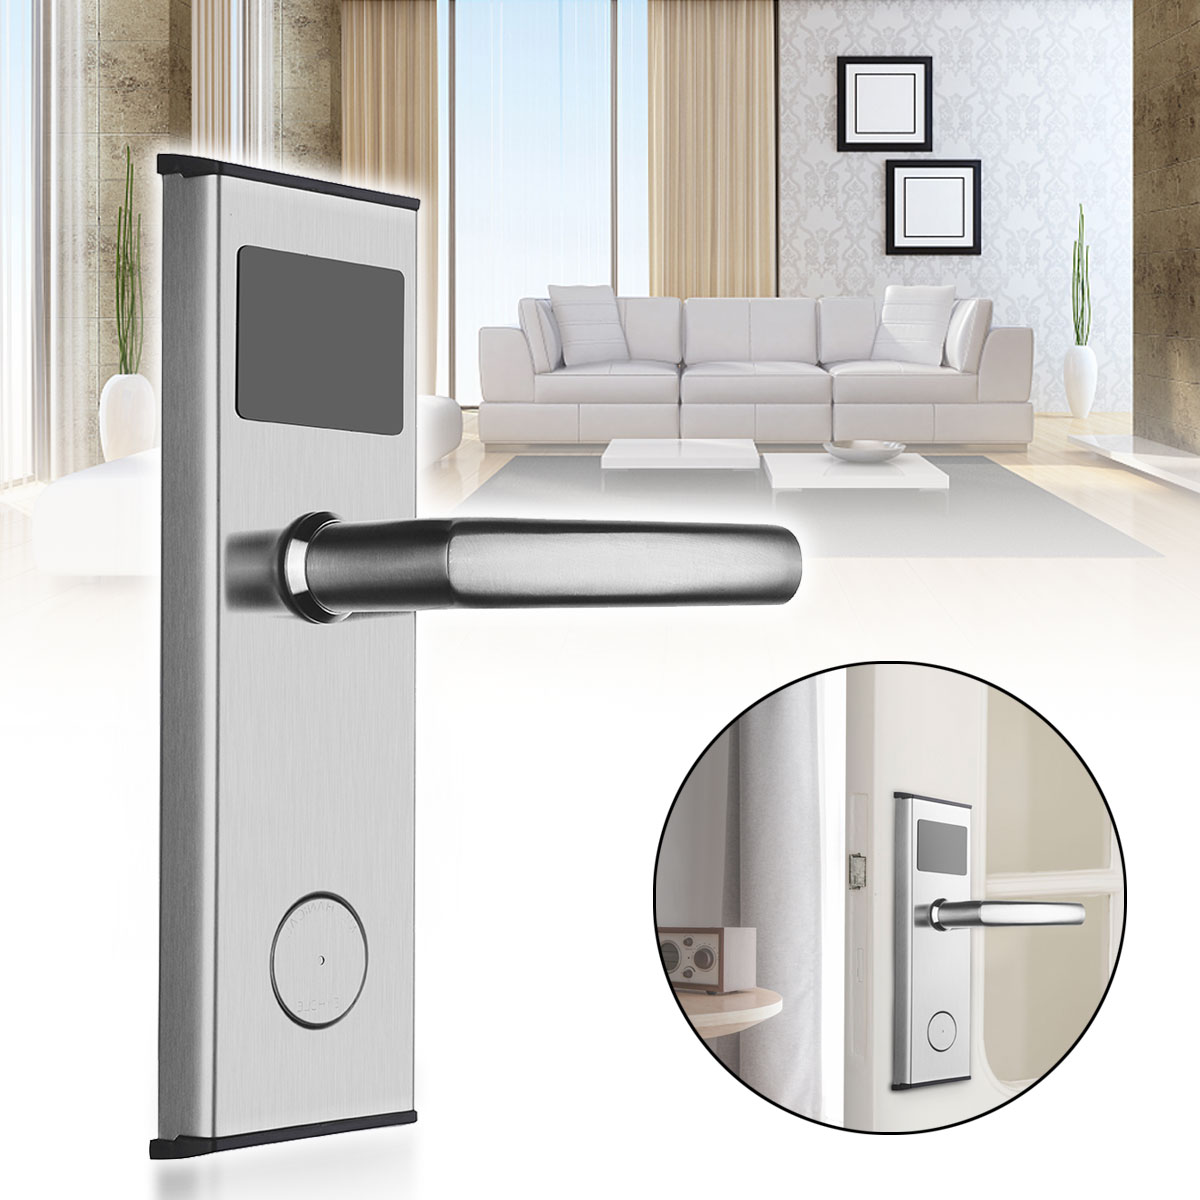 Safurance Digital Card Lock Security Stainless Steel Intelligent RFID Digital Card Key Unlock Hotel Door Lock System Door Locks